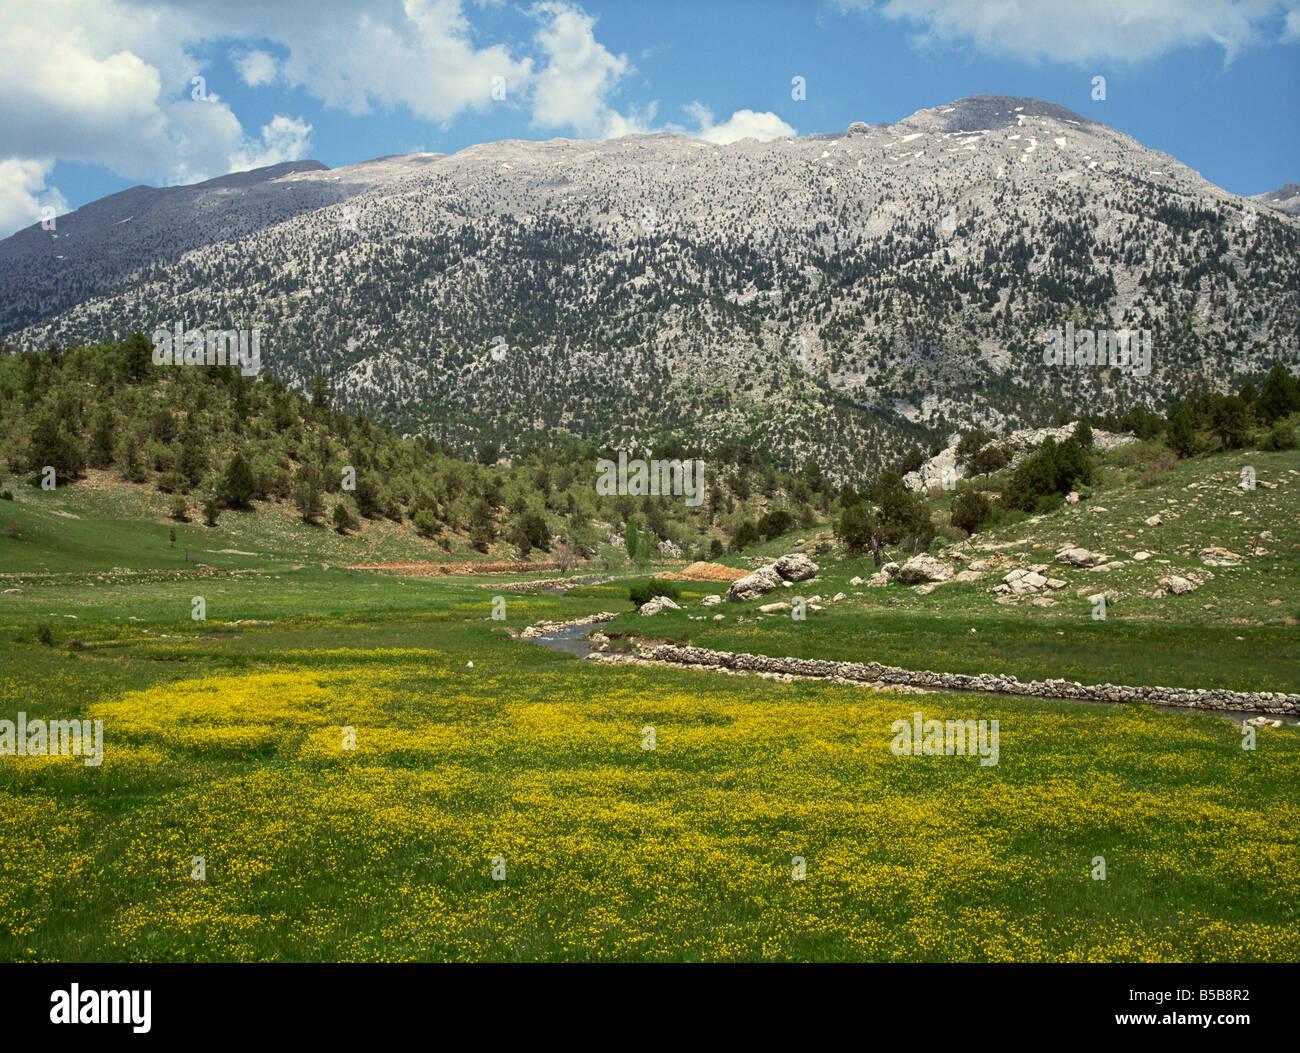 Springtime in the hills near Guzelyurt, south of Nevsehir, Anatolia, Turkey Minor, Eurasia - Stock Image